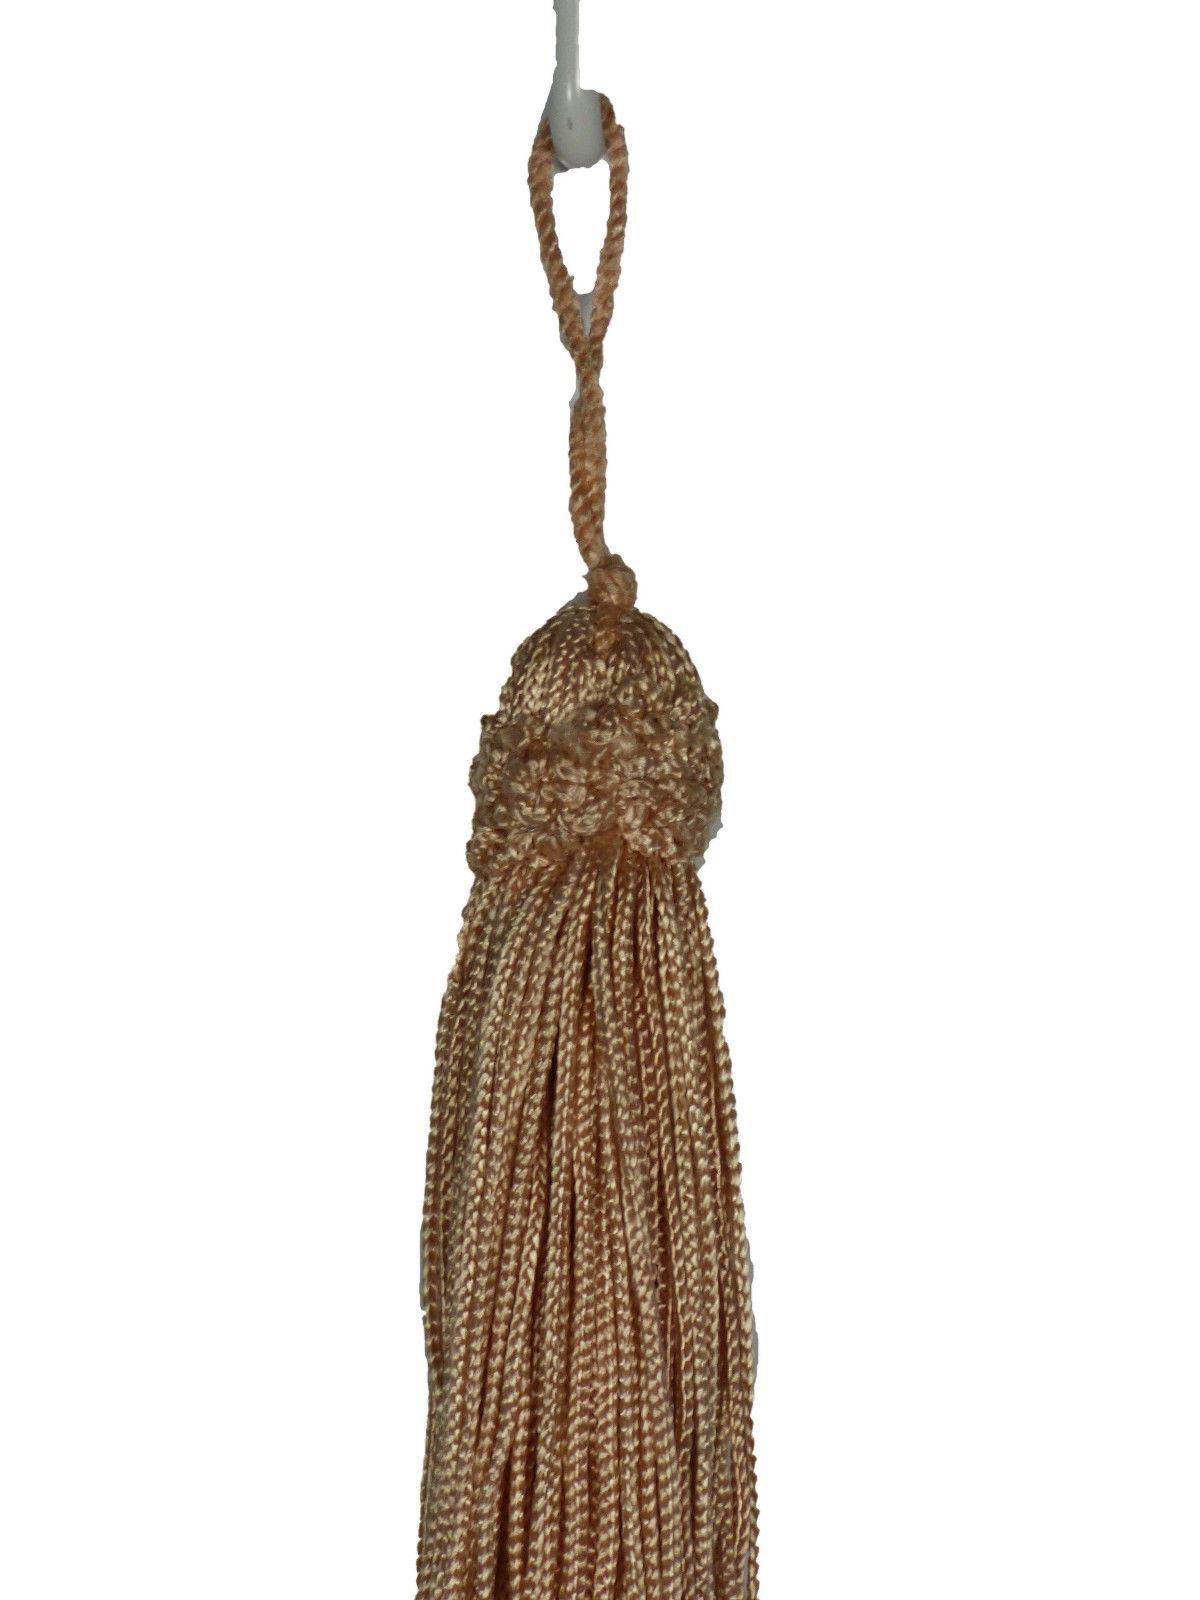 Lot of 2 Conso Trims Princess 11762 K30 DUSTY PEACH Decorative Chainette Tassel